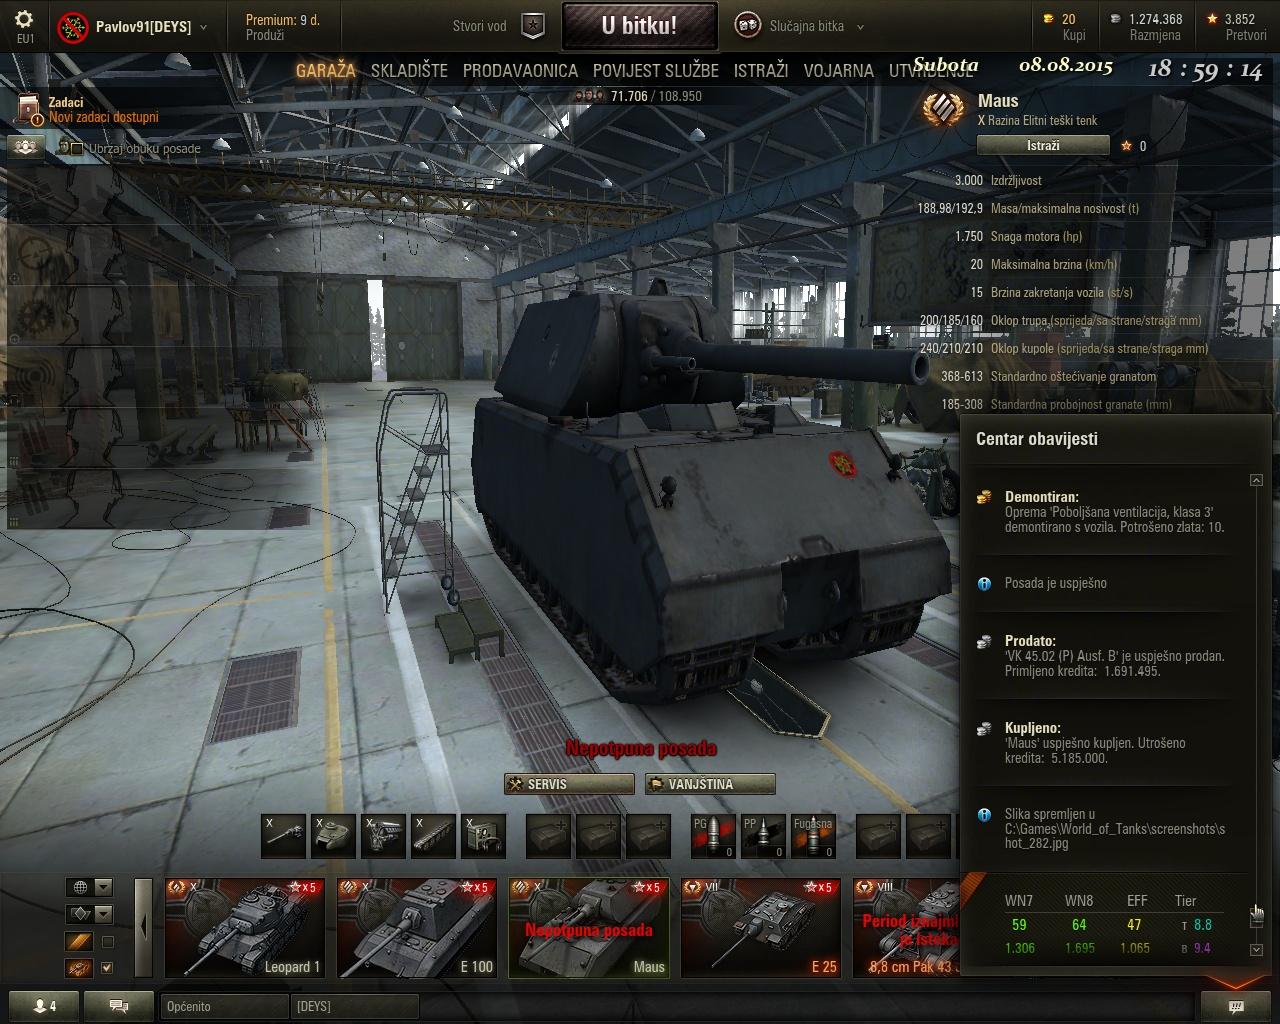 Pavlov91 - mighty MAUS Shot_283